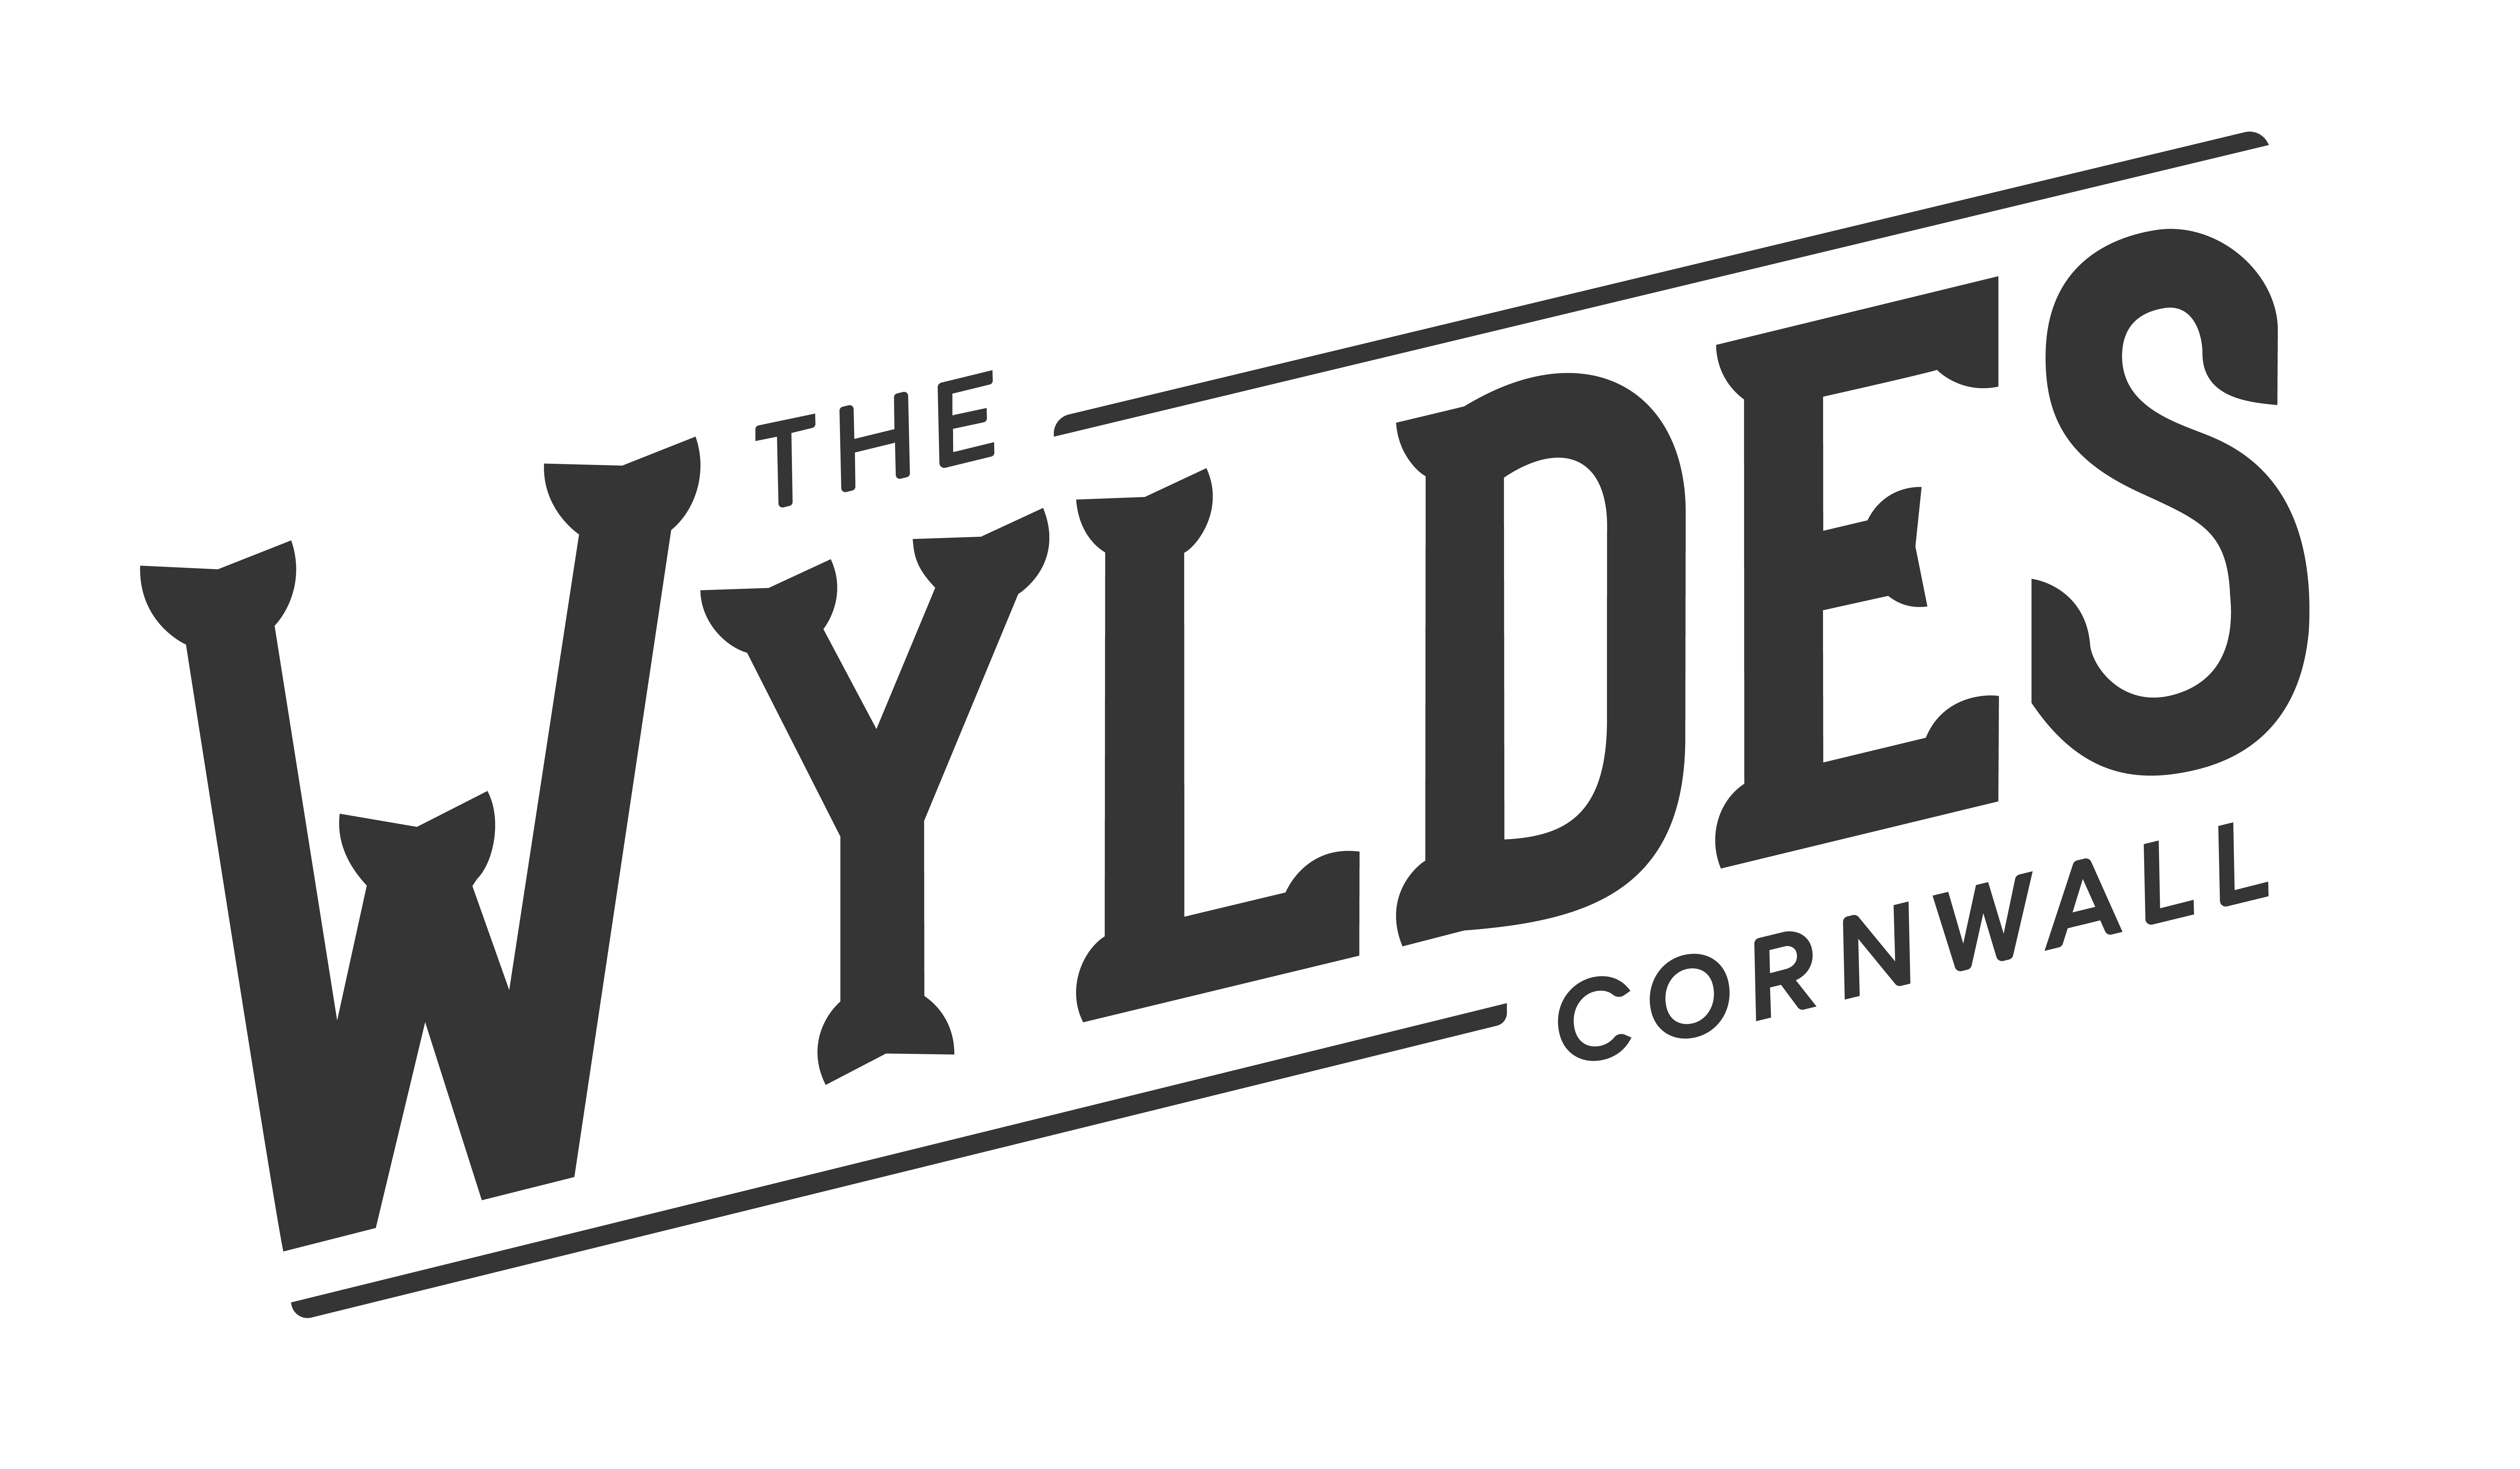 The Wyldes